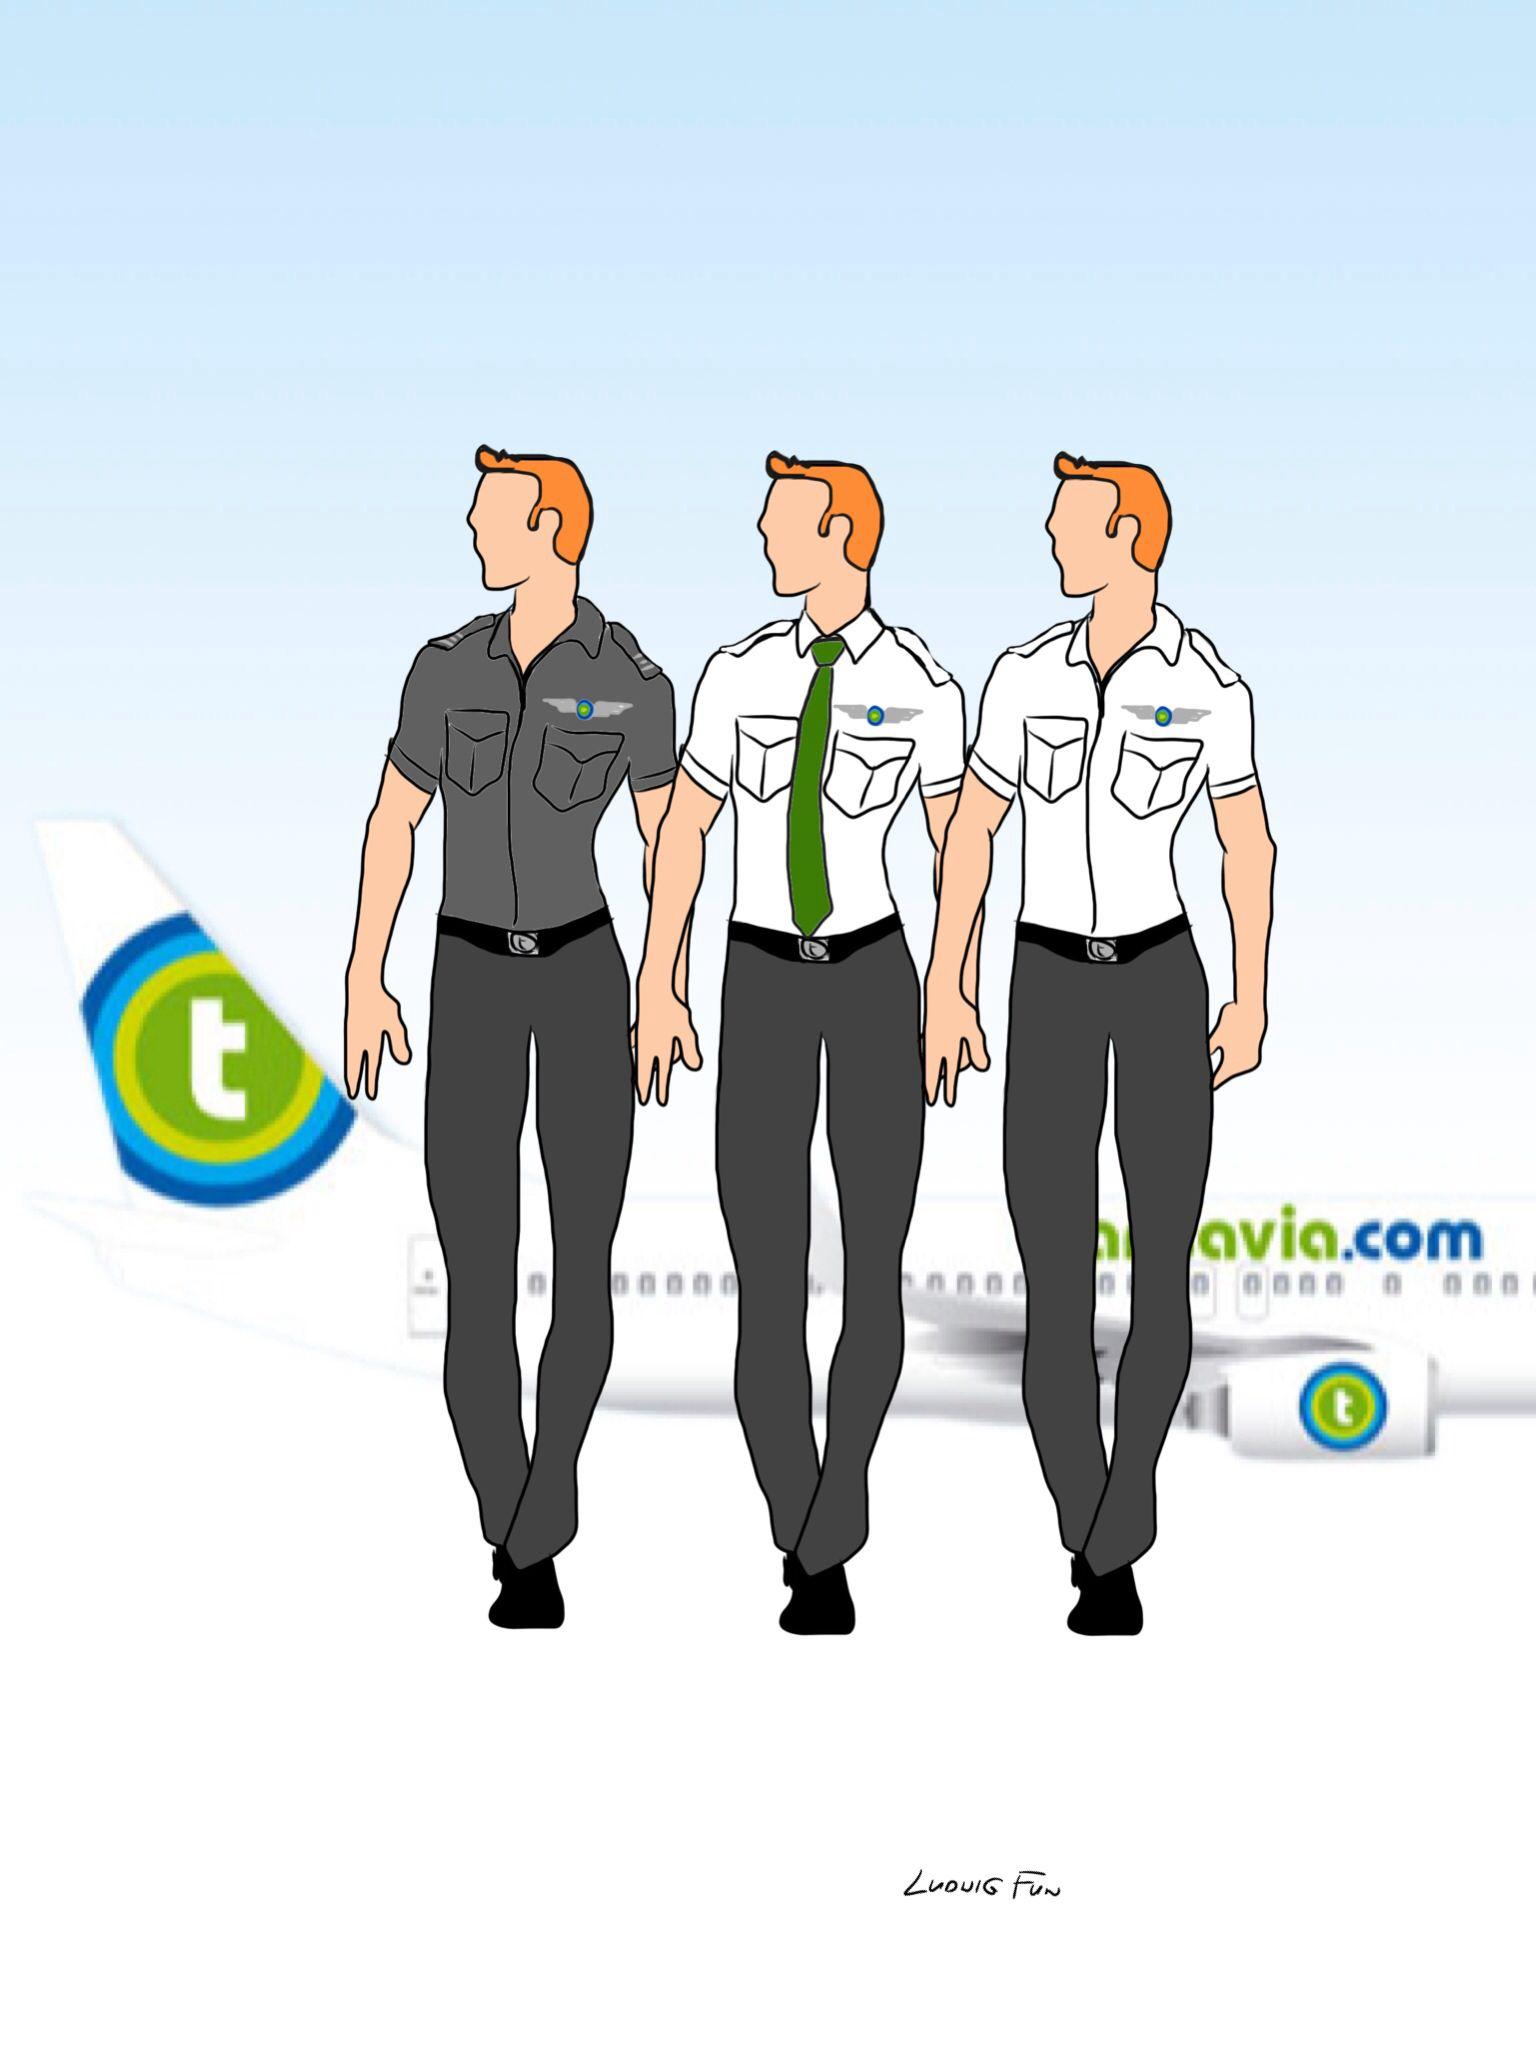 Shirt design concepts - Design Concept For Transavia Com S Upcoming New Cabin Crew Uniforms Three Color Variations On